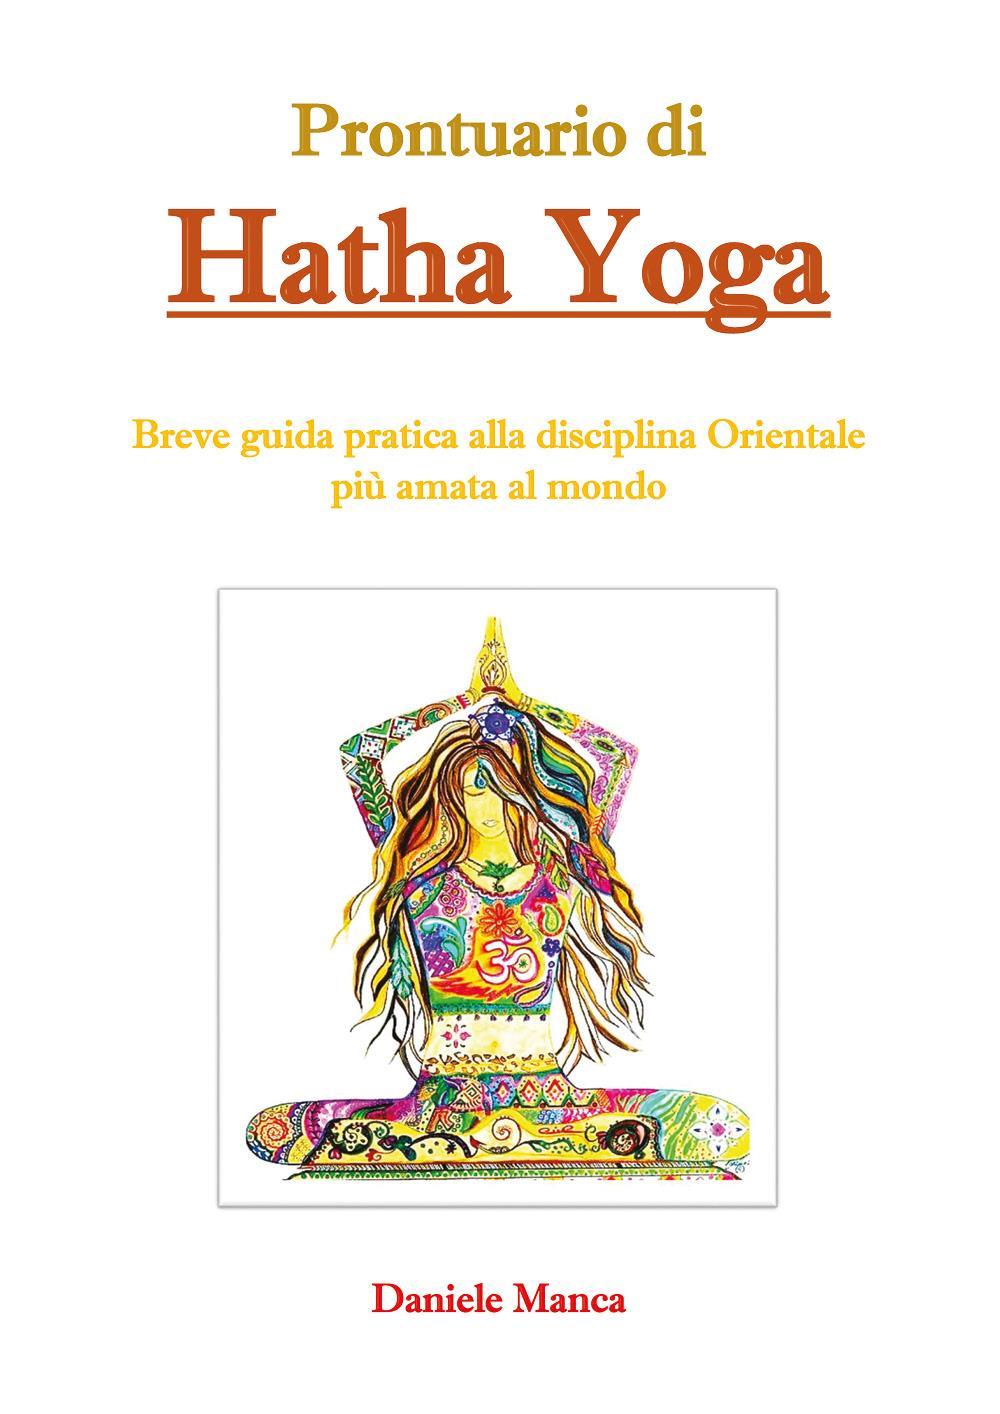 Prontuario di Hatha Yoga